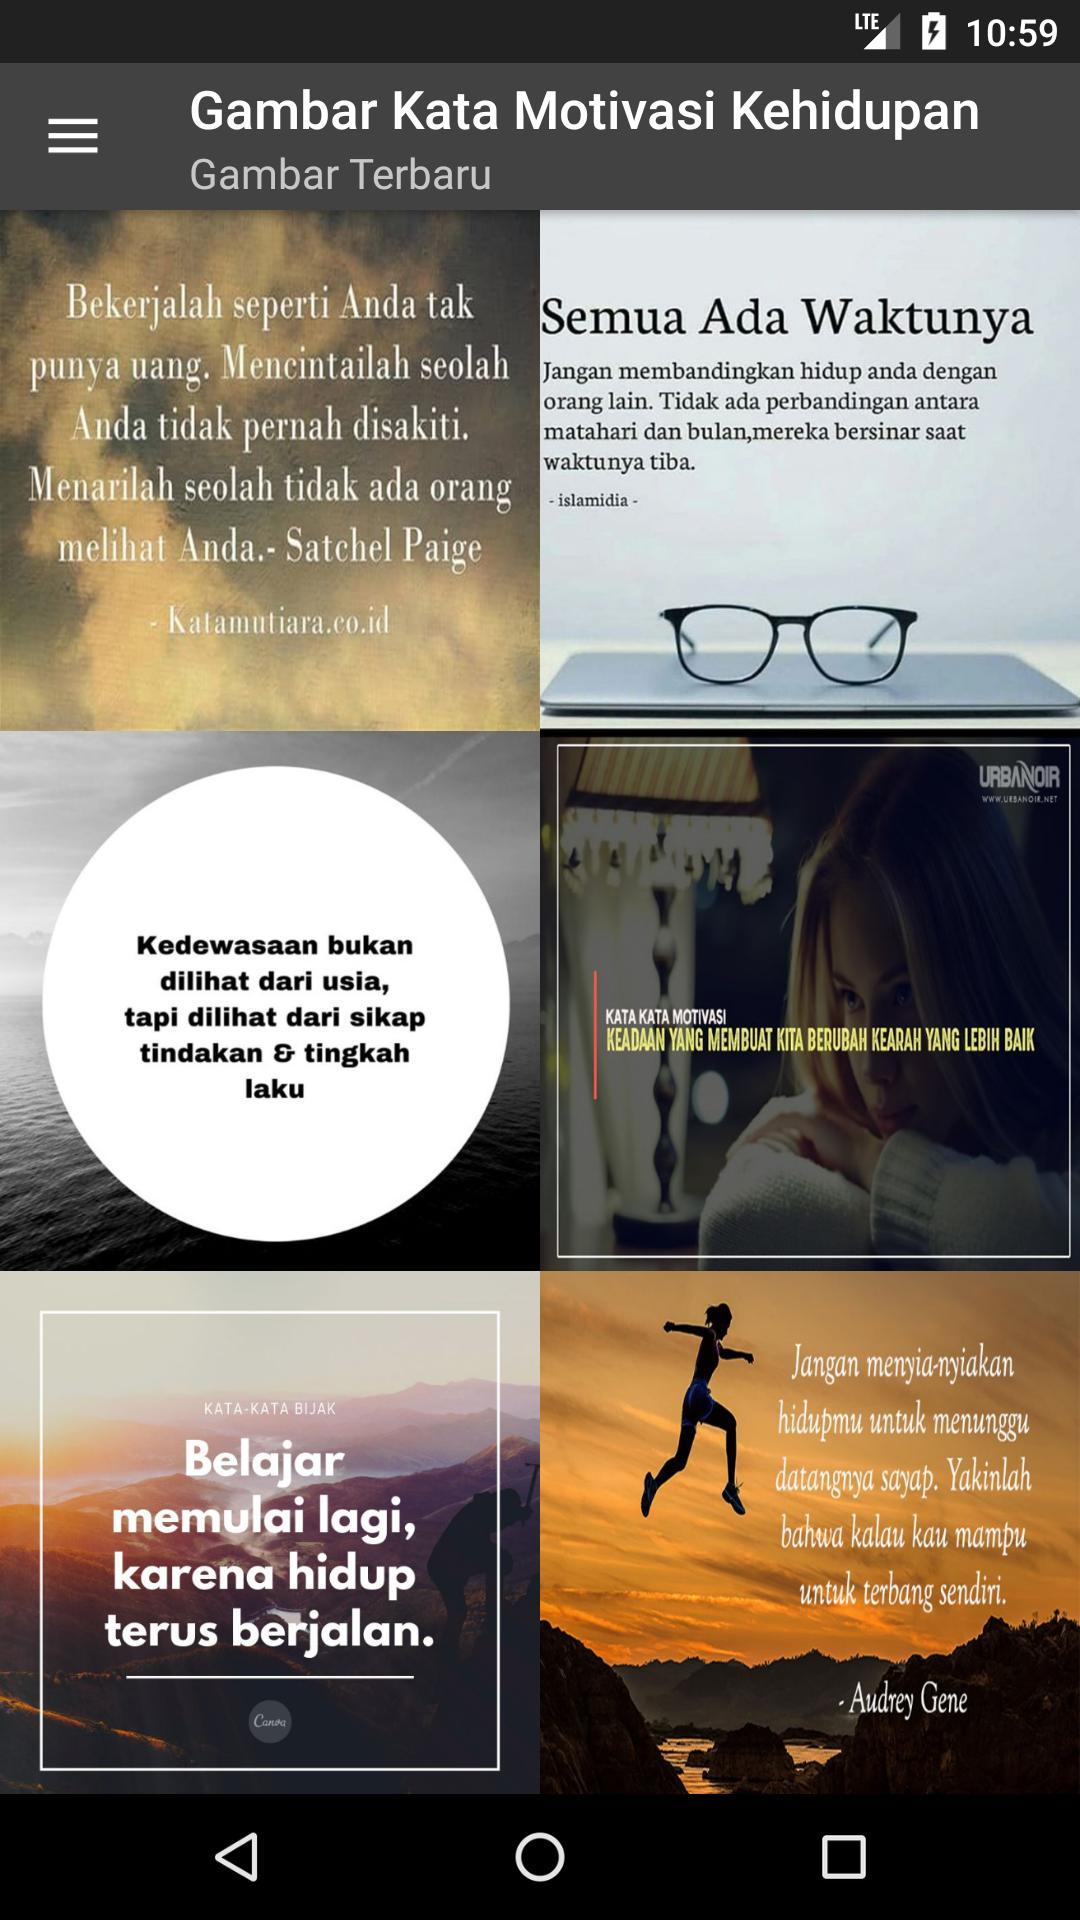 Gambar Kata Motivasi Kehidupan For Android Apk Download